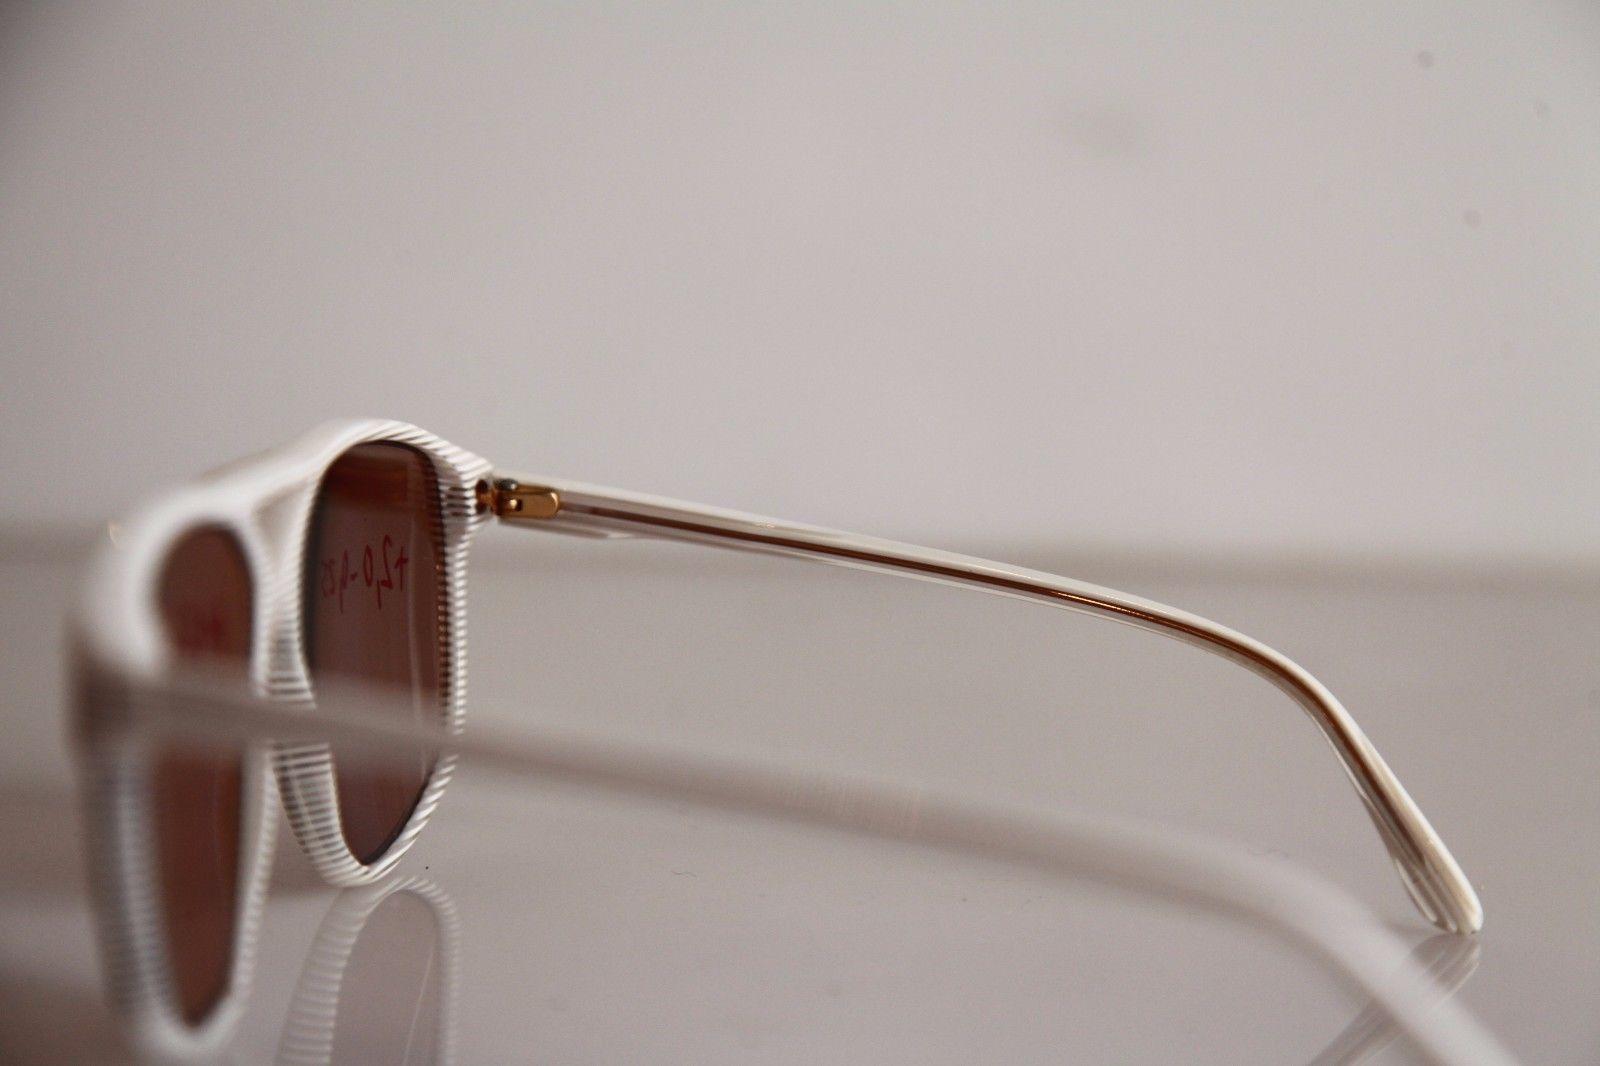 METZLER Eyewear,  Crystal White frame, RX-Able Prescription lenses. Germany